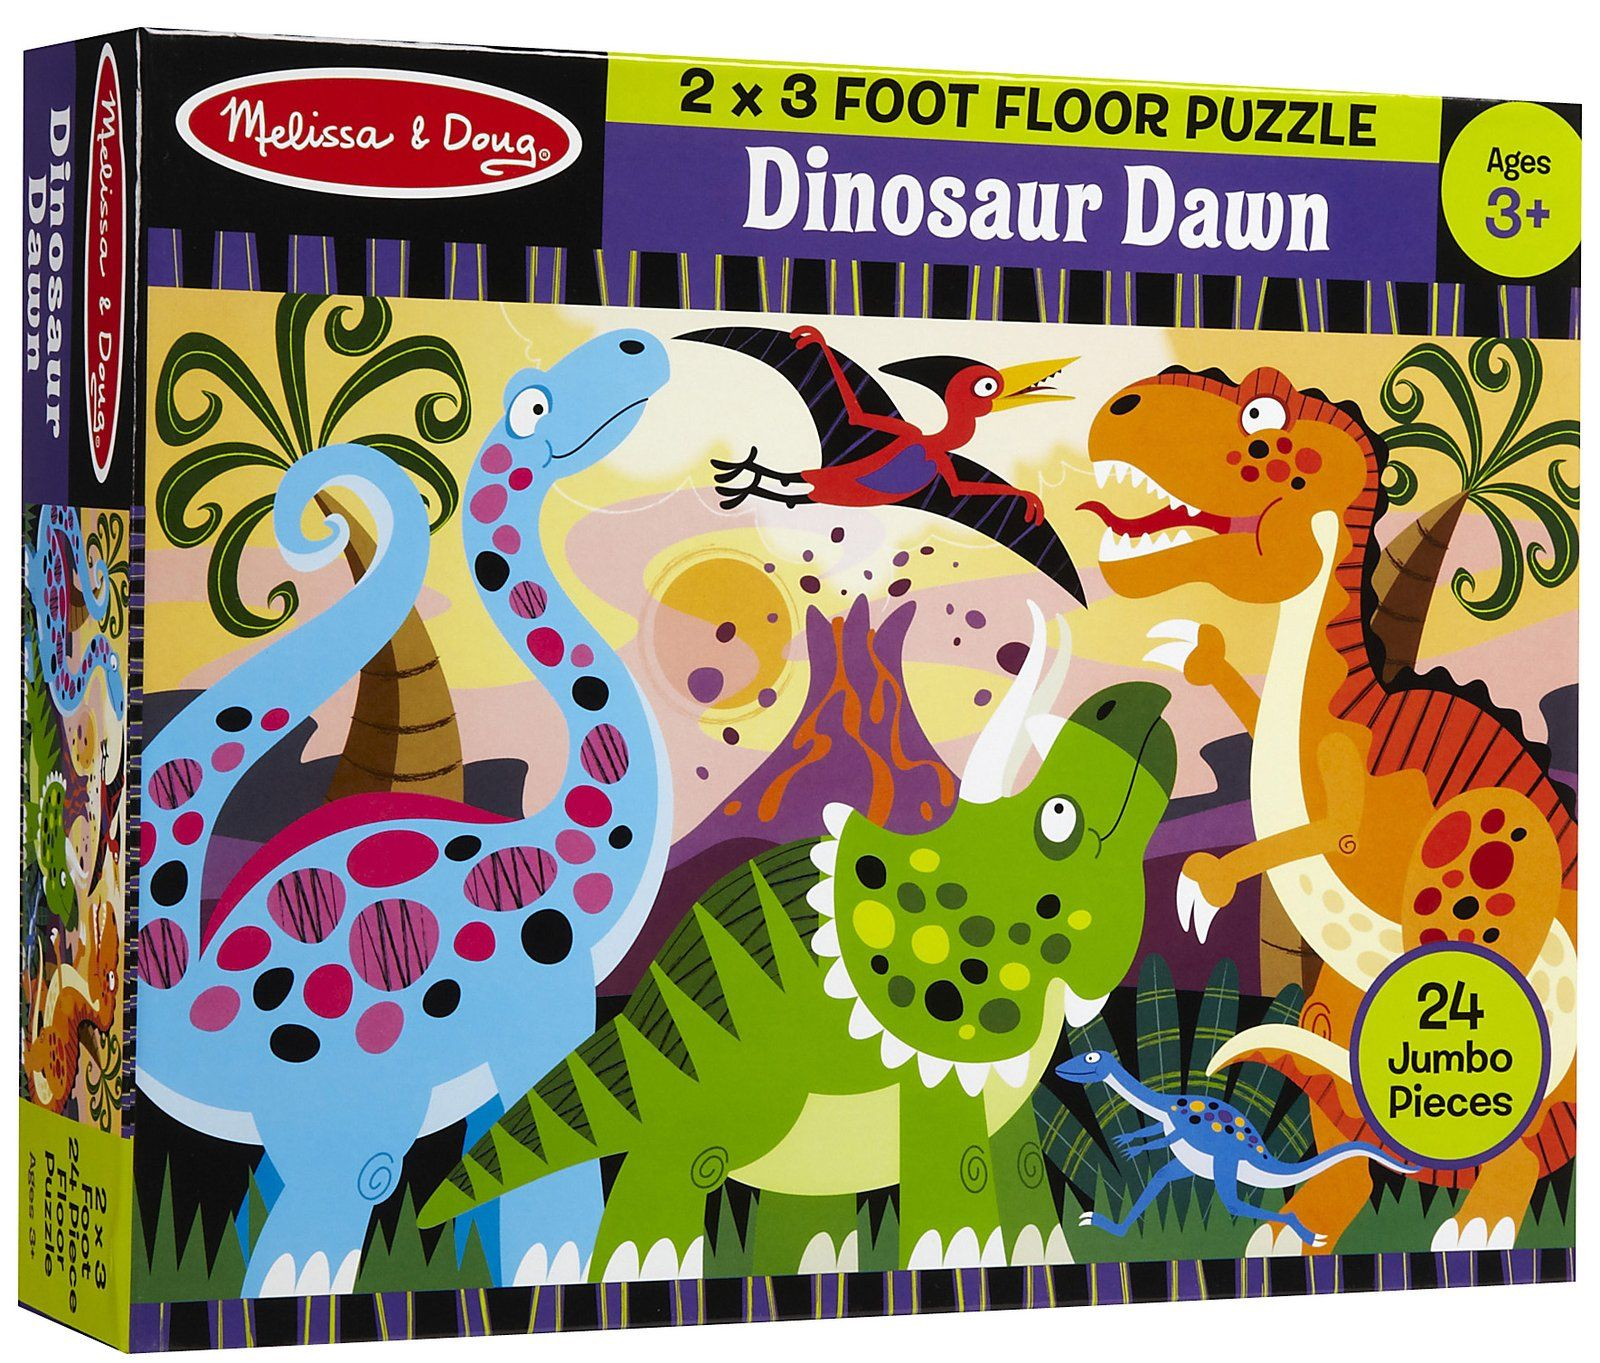 Melissa Doug Dinosaur Dawn Floor Puzzle Pc Best Price - Melissa and doug floor puzzle